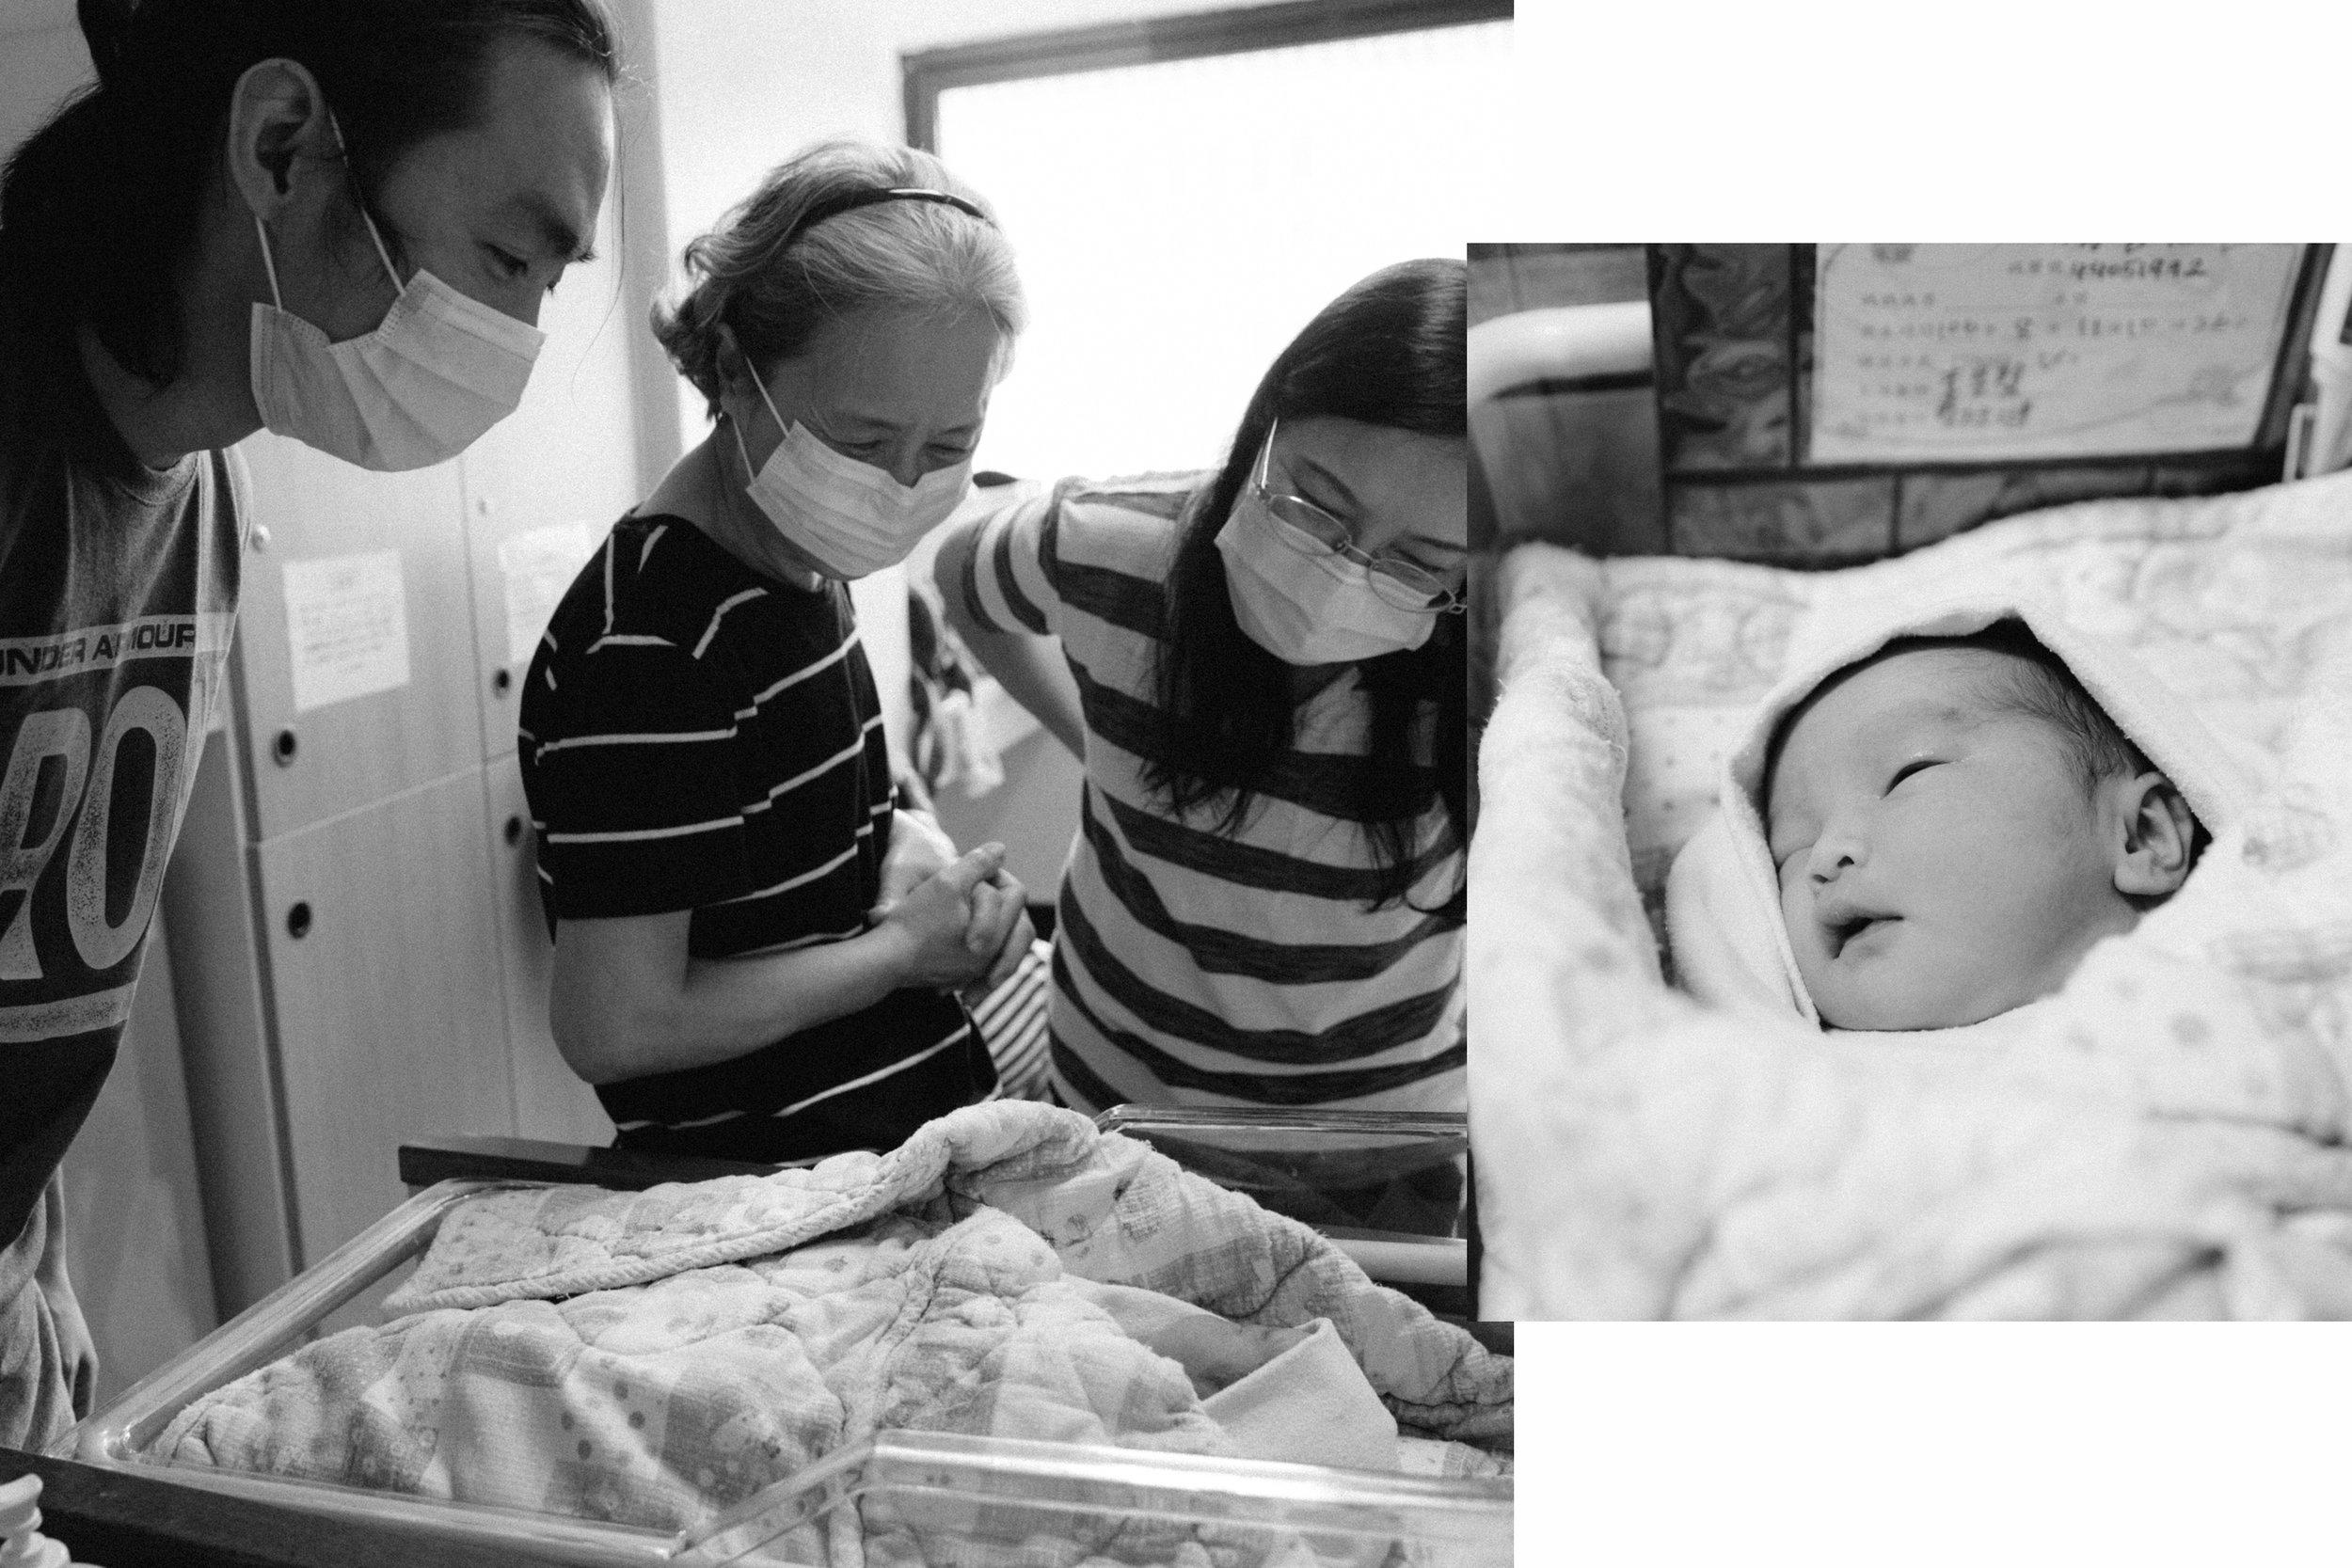 star-ken-firstday-newborn-baby-taipei-台北榮總-42.jpg